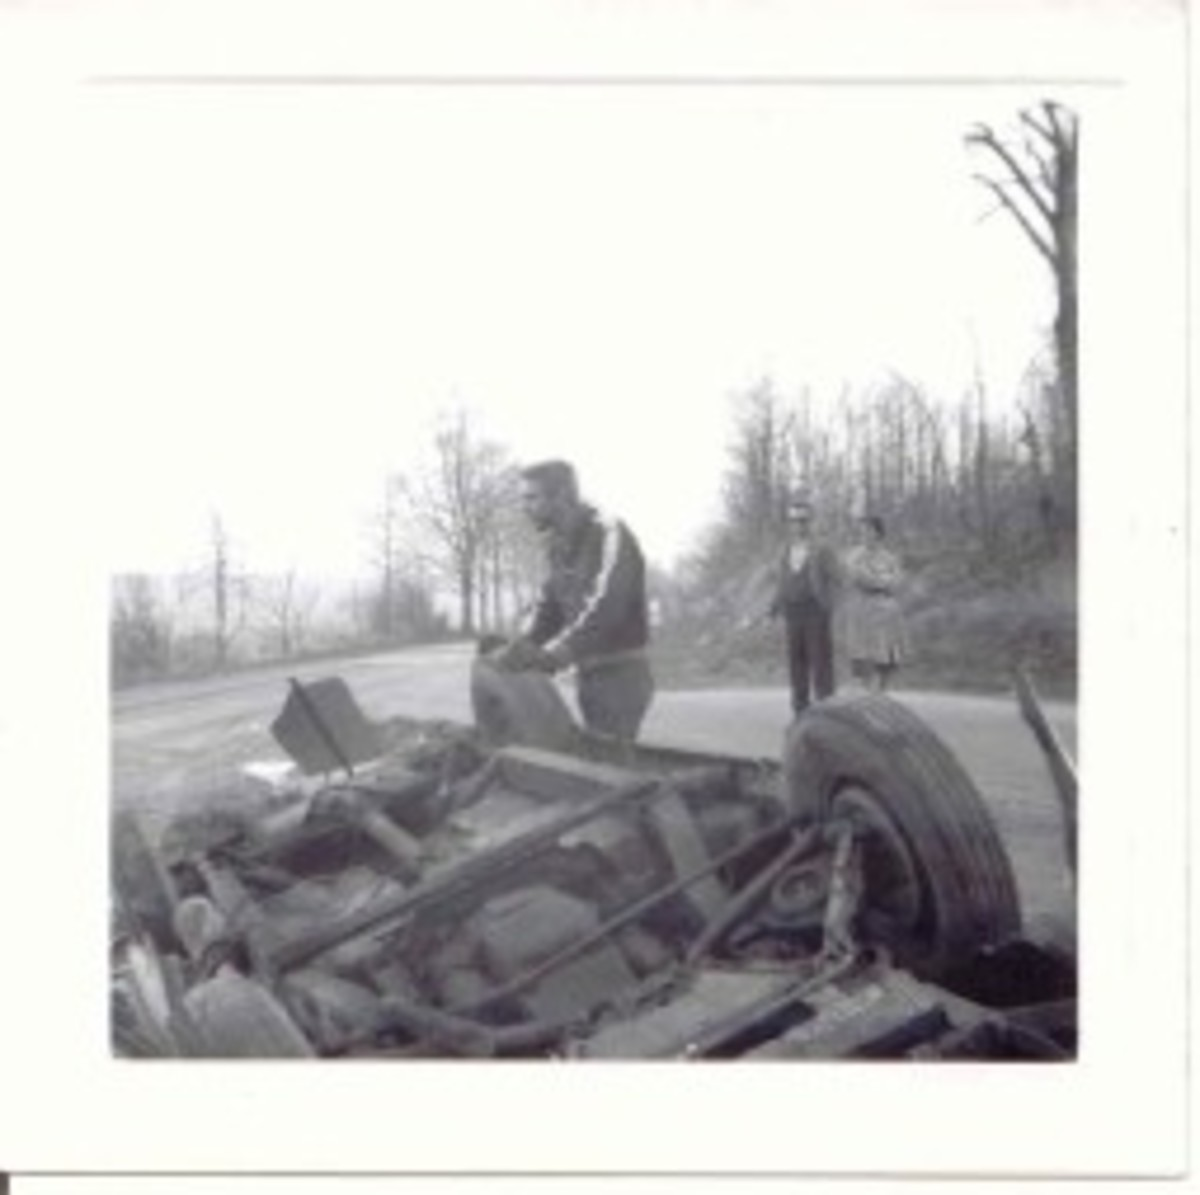 Red & White Darrin 1963 wreck, Bob Benz & onlookers, pic 2.jpg